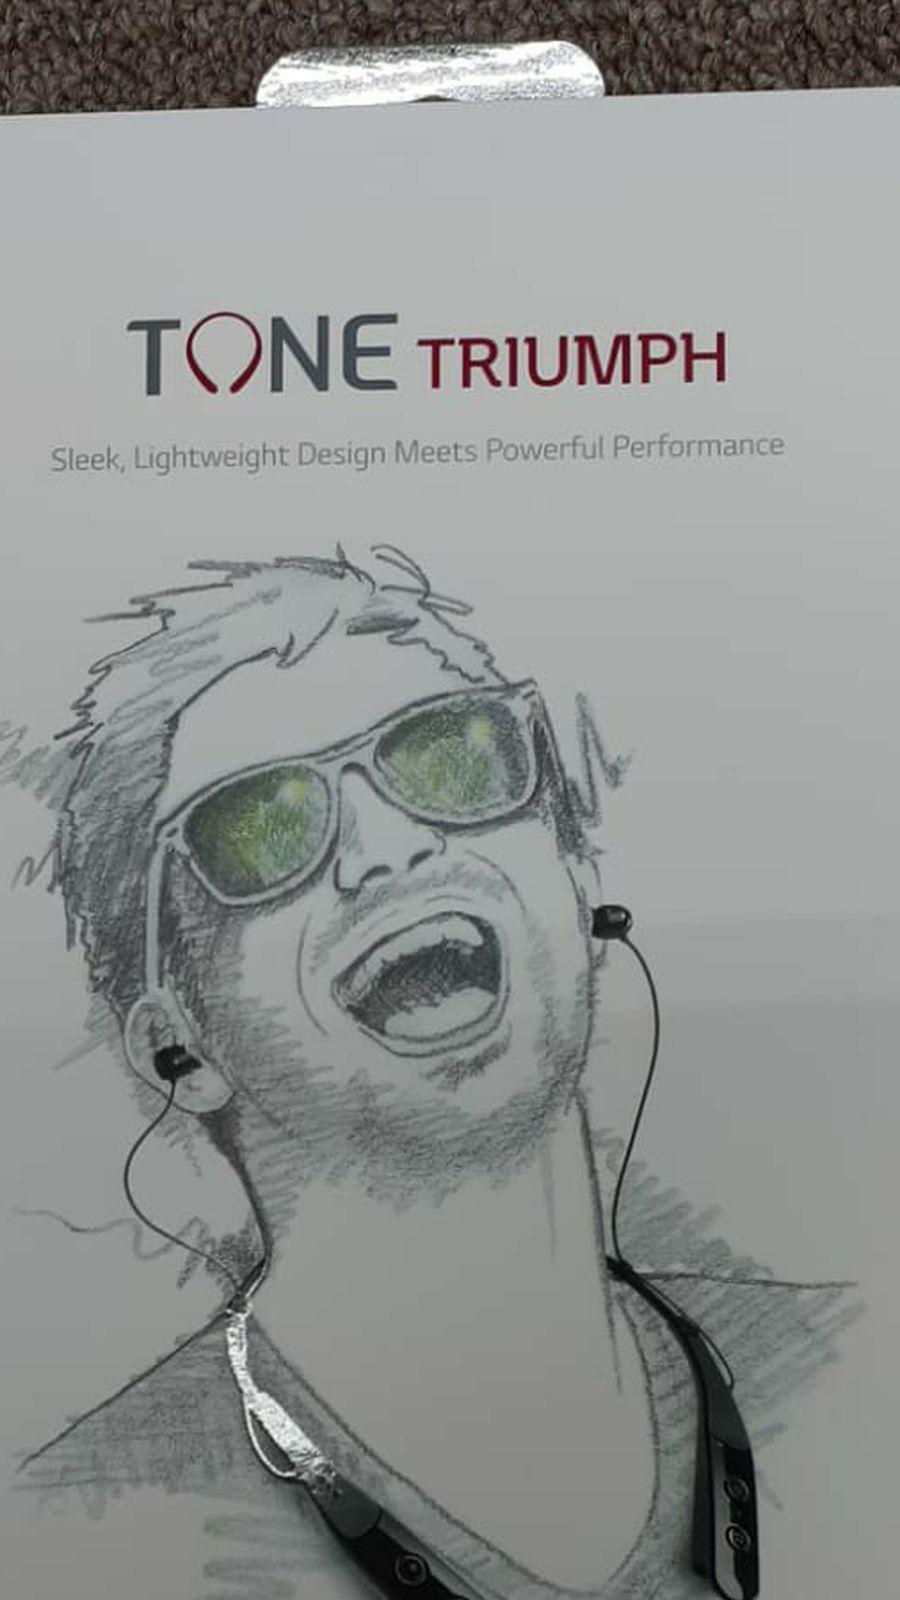 LG Tone Triumph Bluetooth Headset